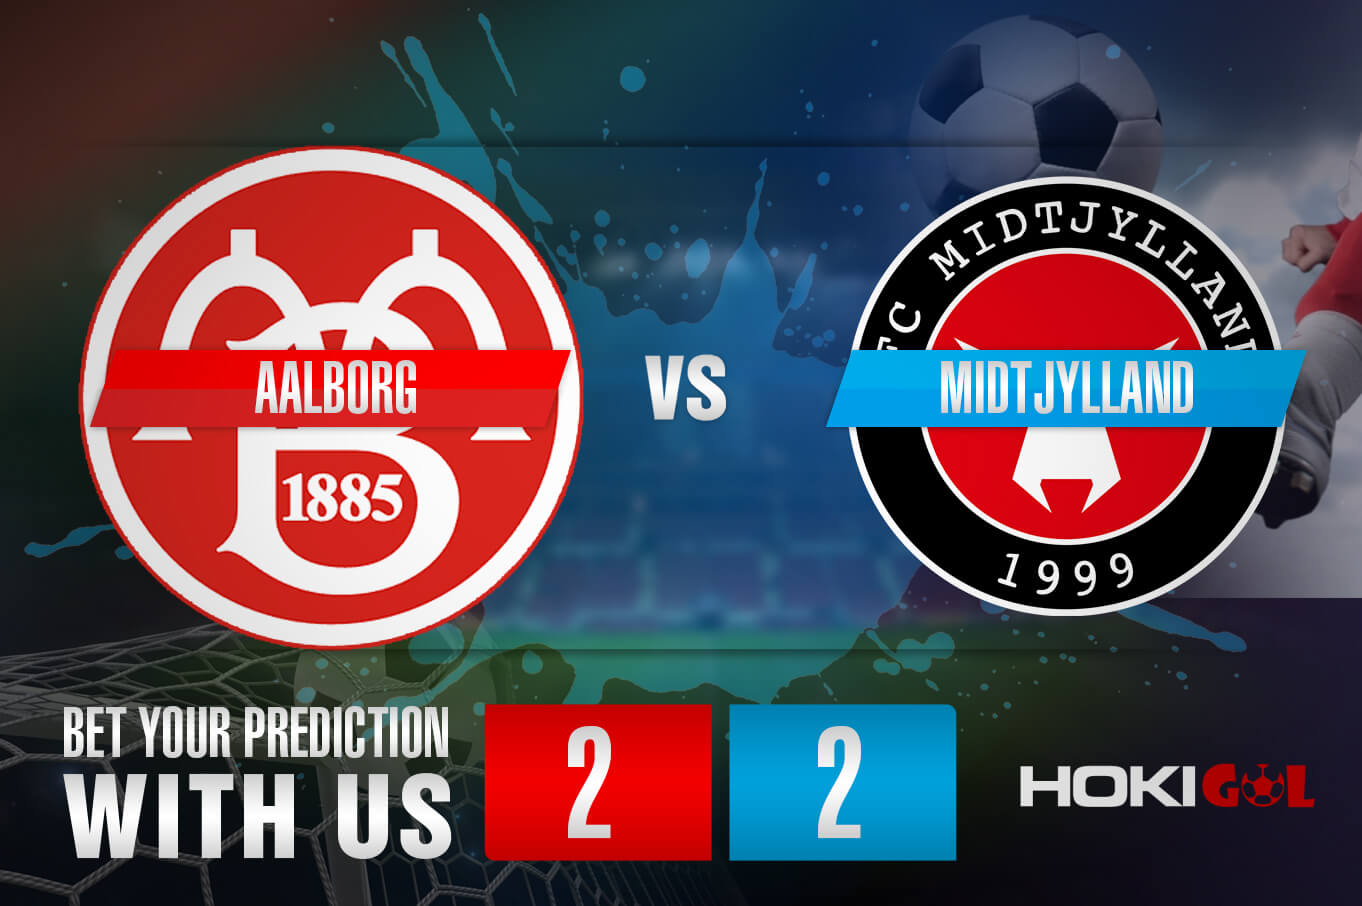 Prediksi Bola Aalborg Vs Midtjylland 24 Juli 2021